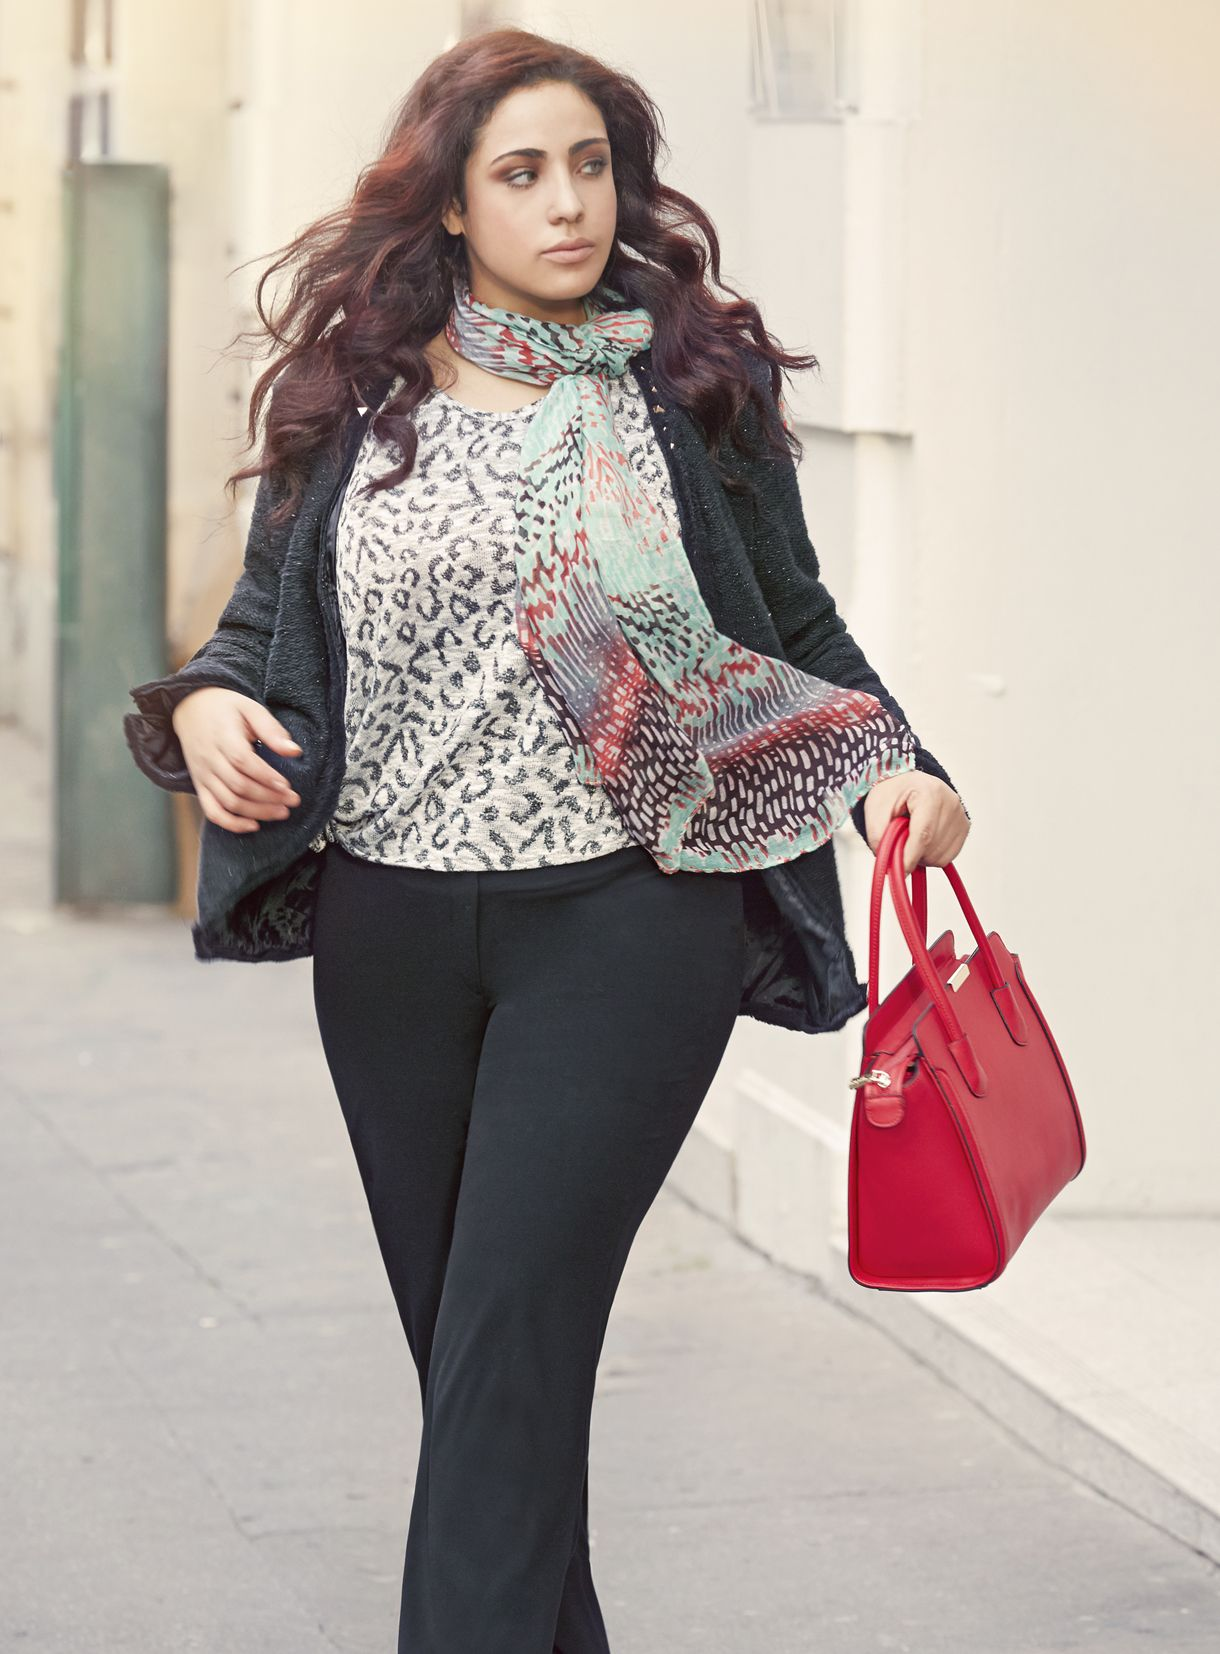 Elegante Mode In Grossen Grossen Modische Business Outfits In Ubergrosse Plus Size Fashion Plus Size Blazer Work Loo Elegante Mode Modische Outfits Outfit